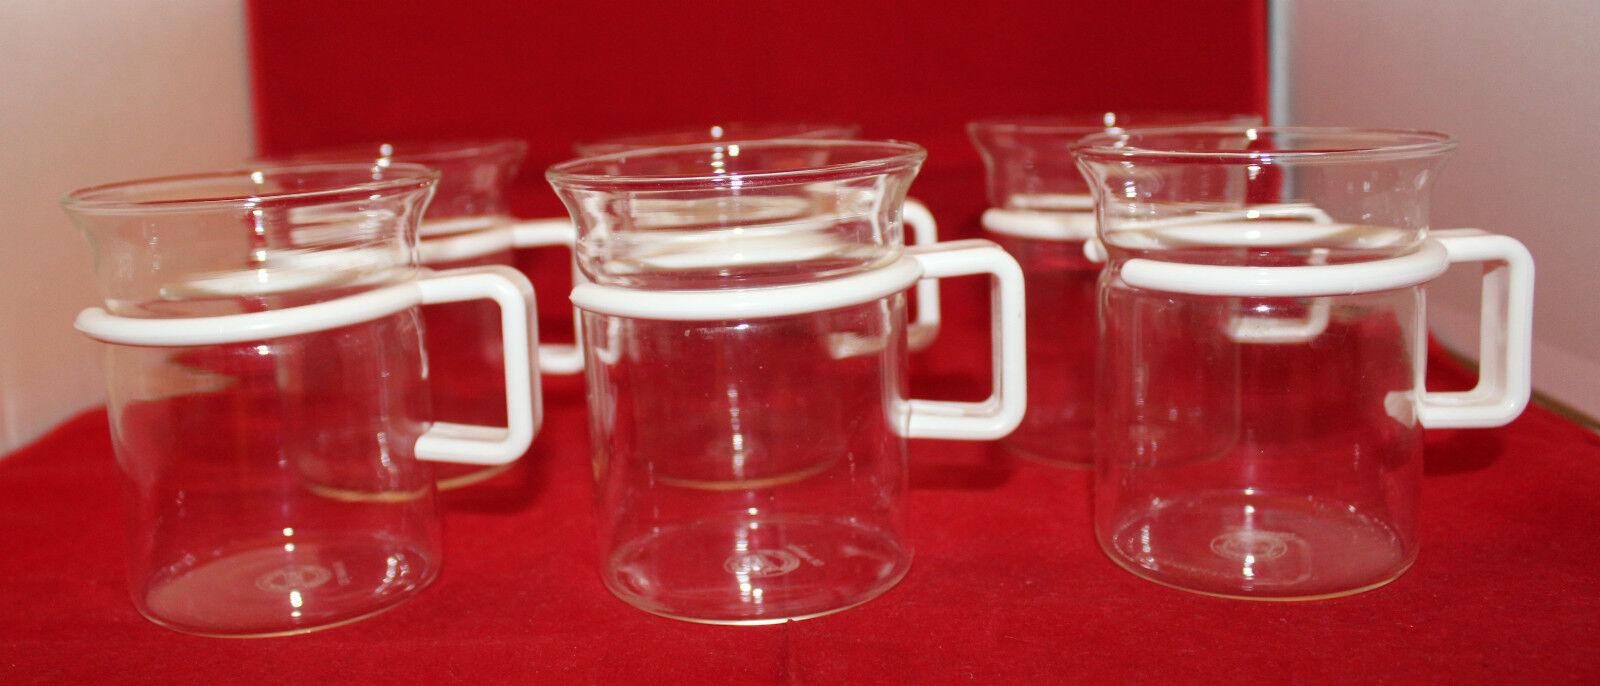 Bodum Bistro Short Hot Iced Clear Glass Coffee Tea Mug Cup Set of 6 White Handle